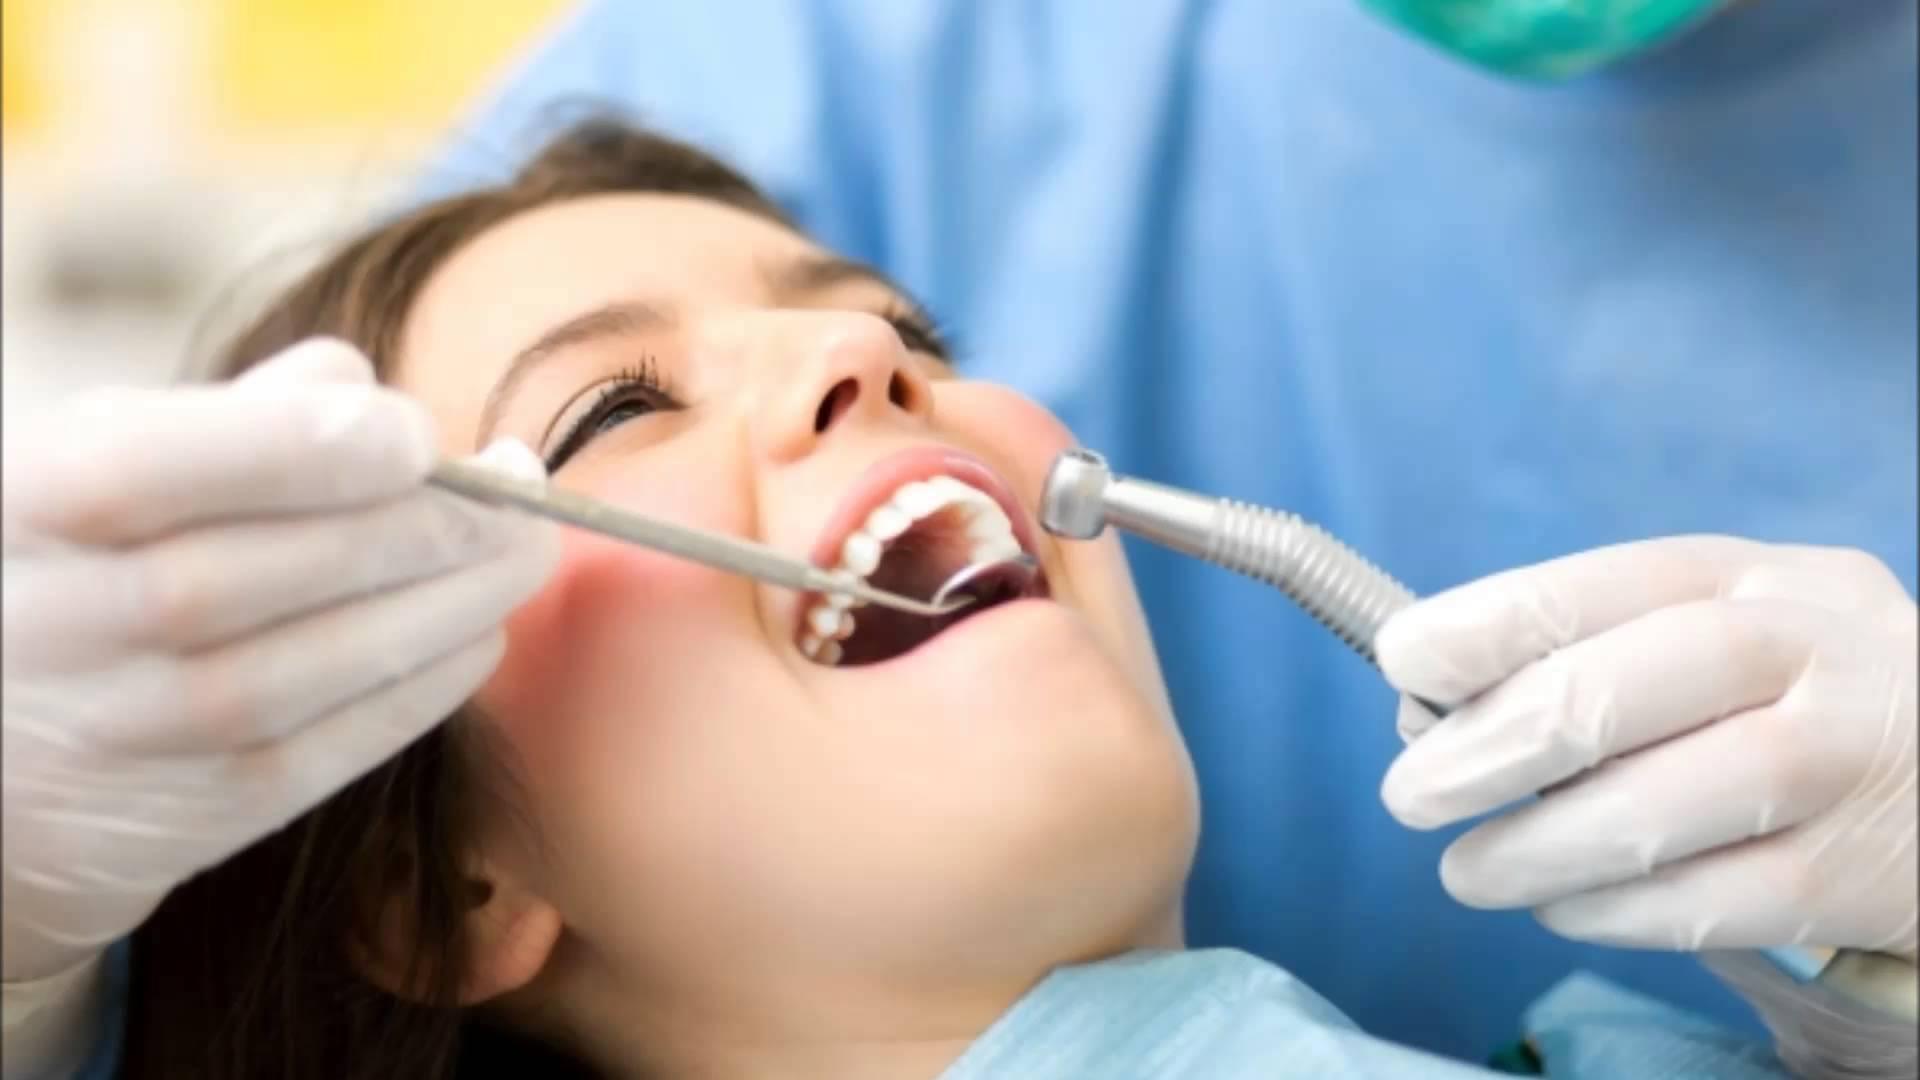 Periksakan Gigi Sebelum Sakit